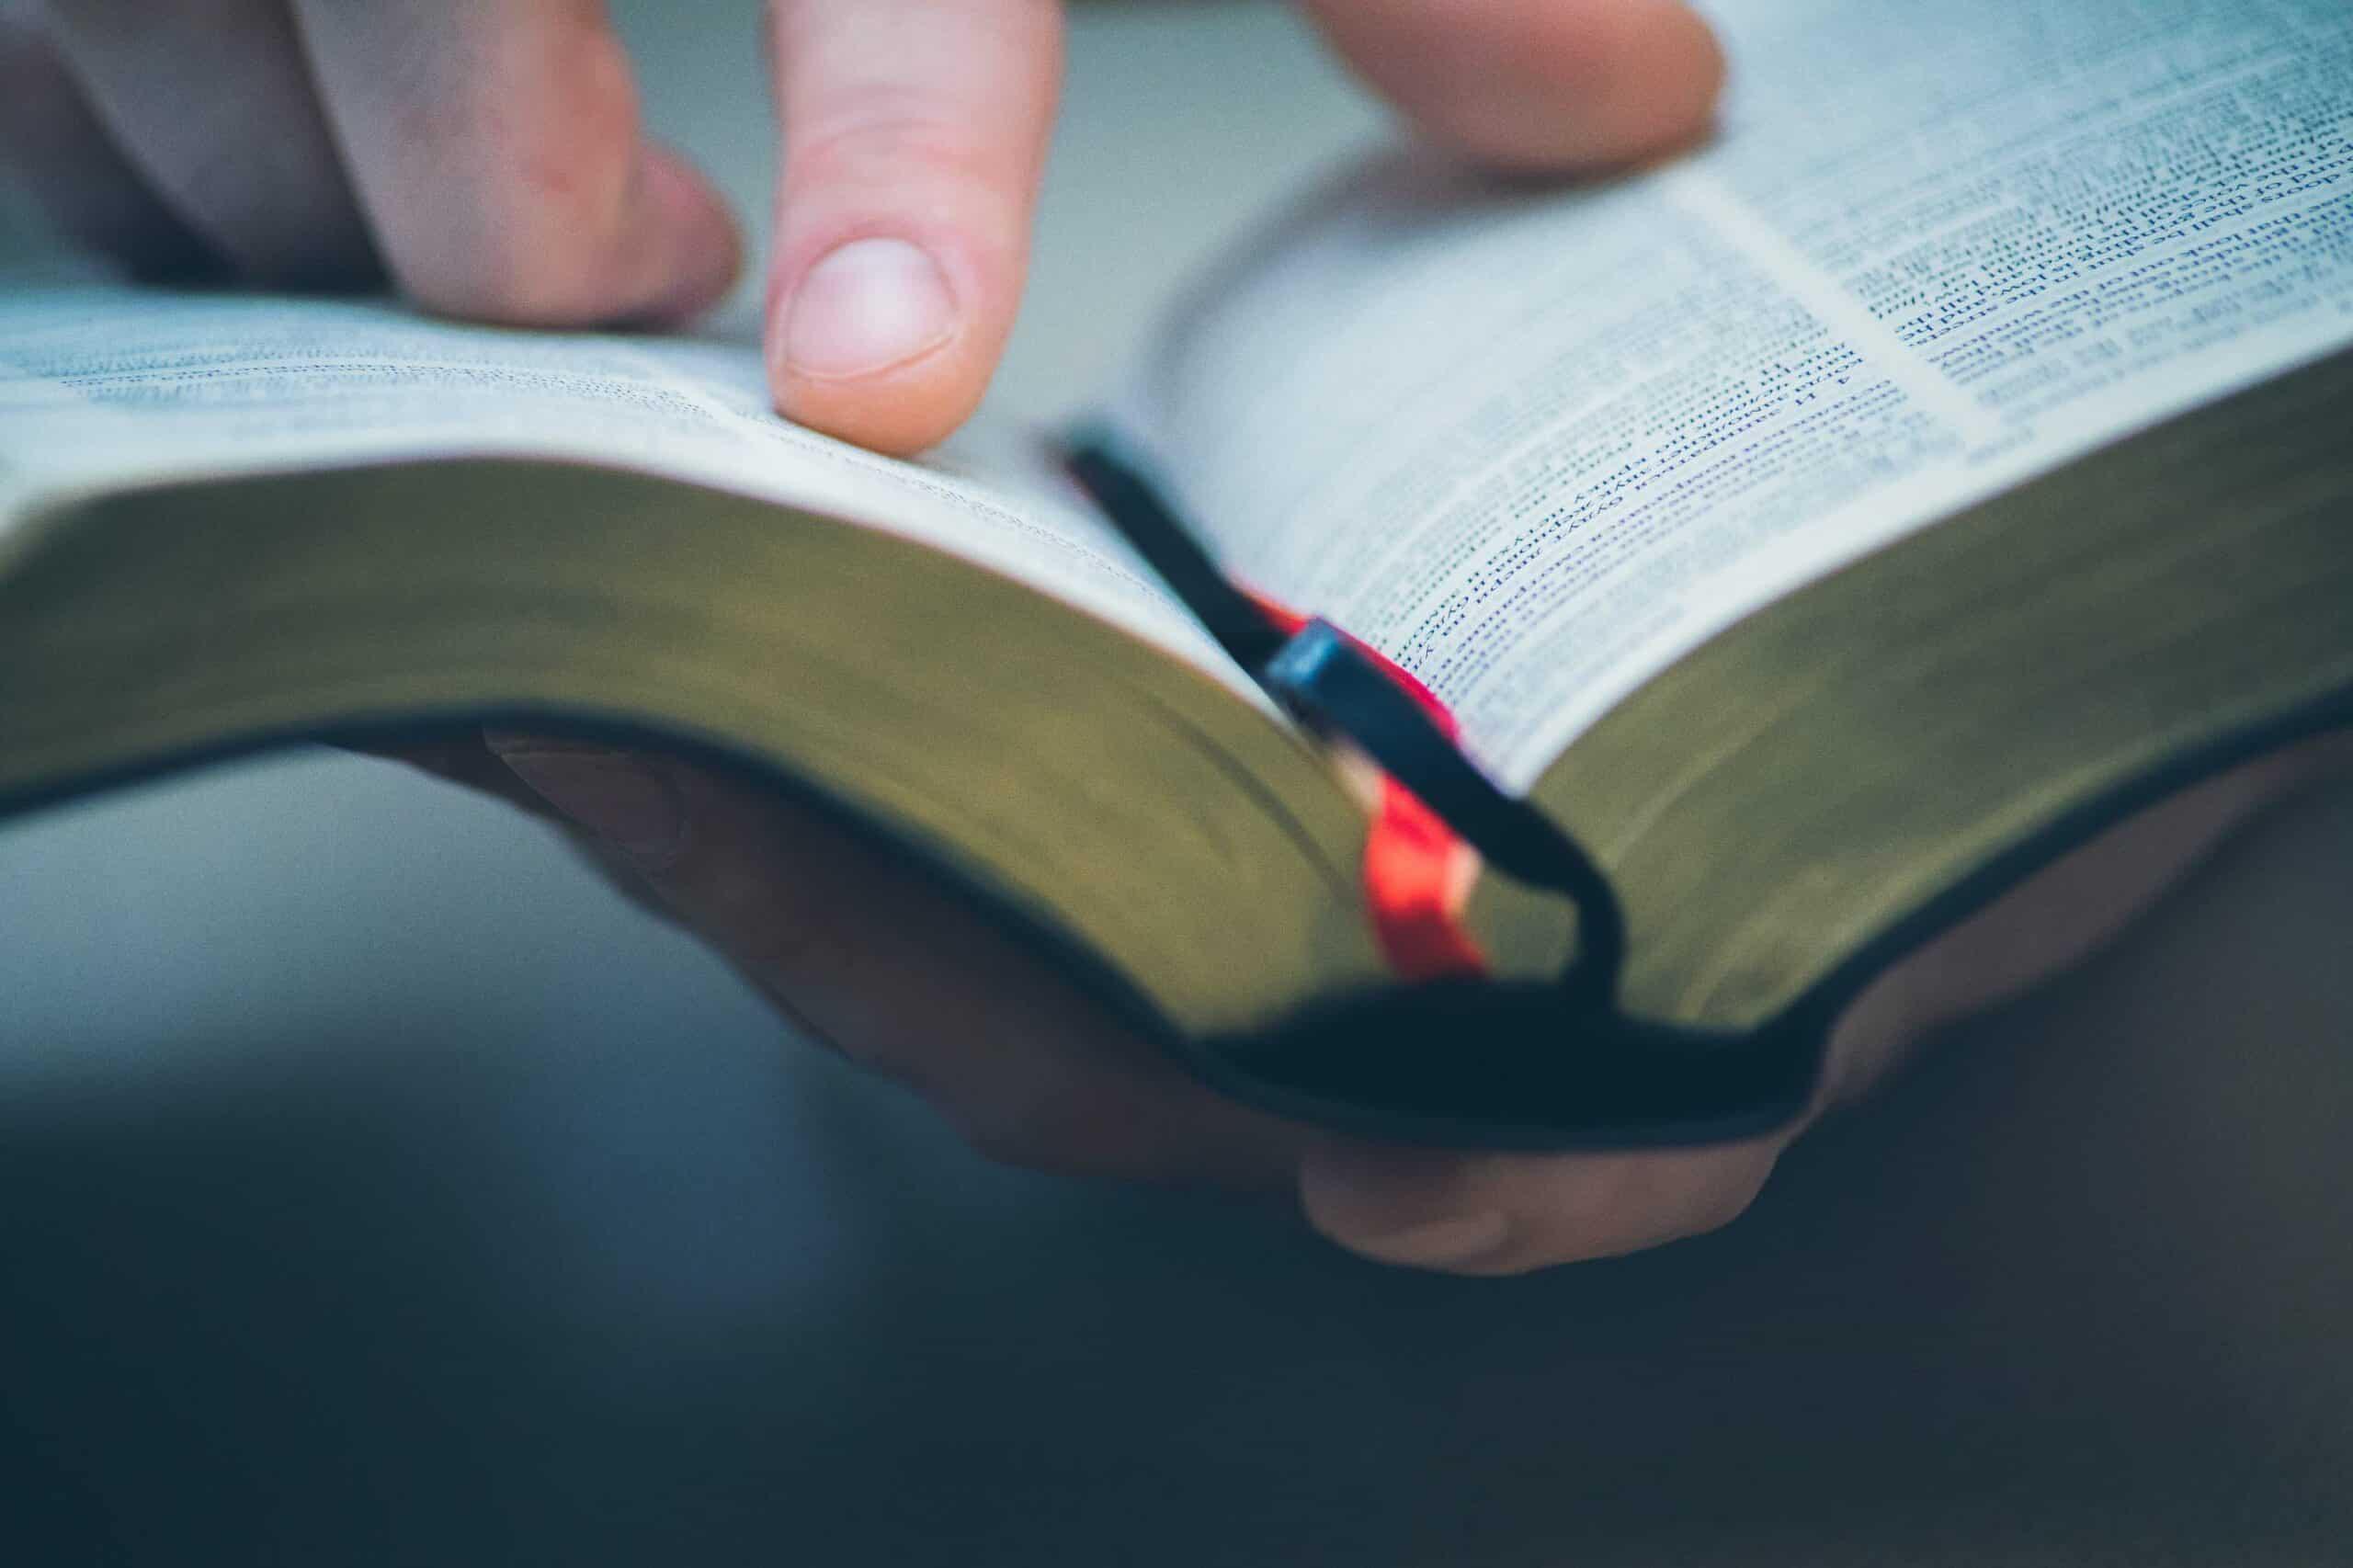 bibleversesaboutfinances